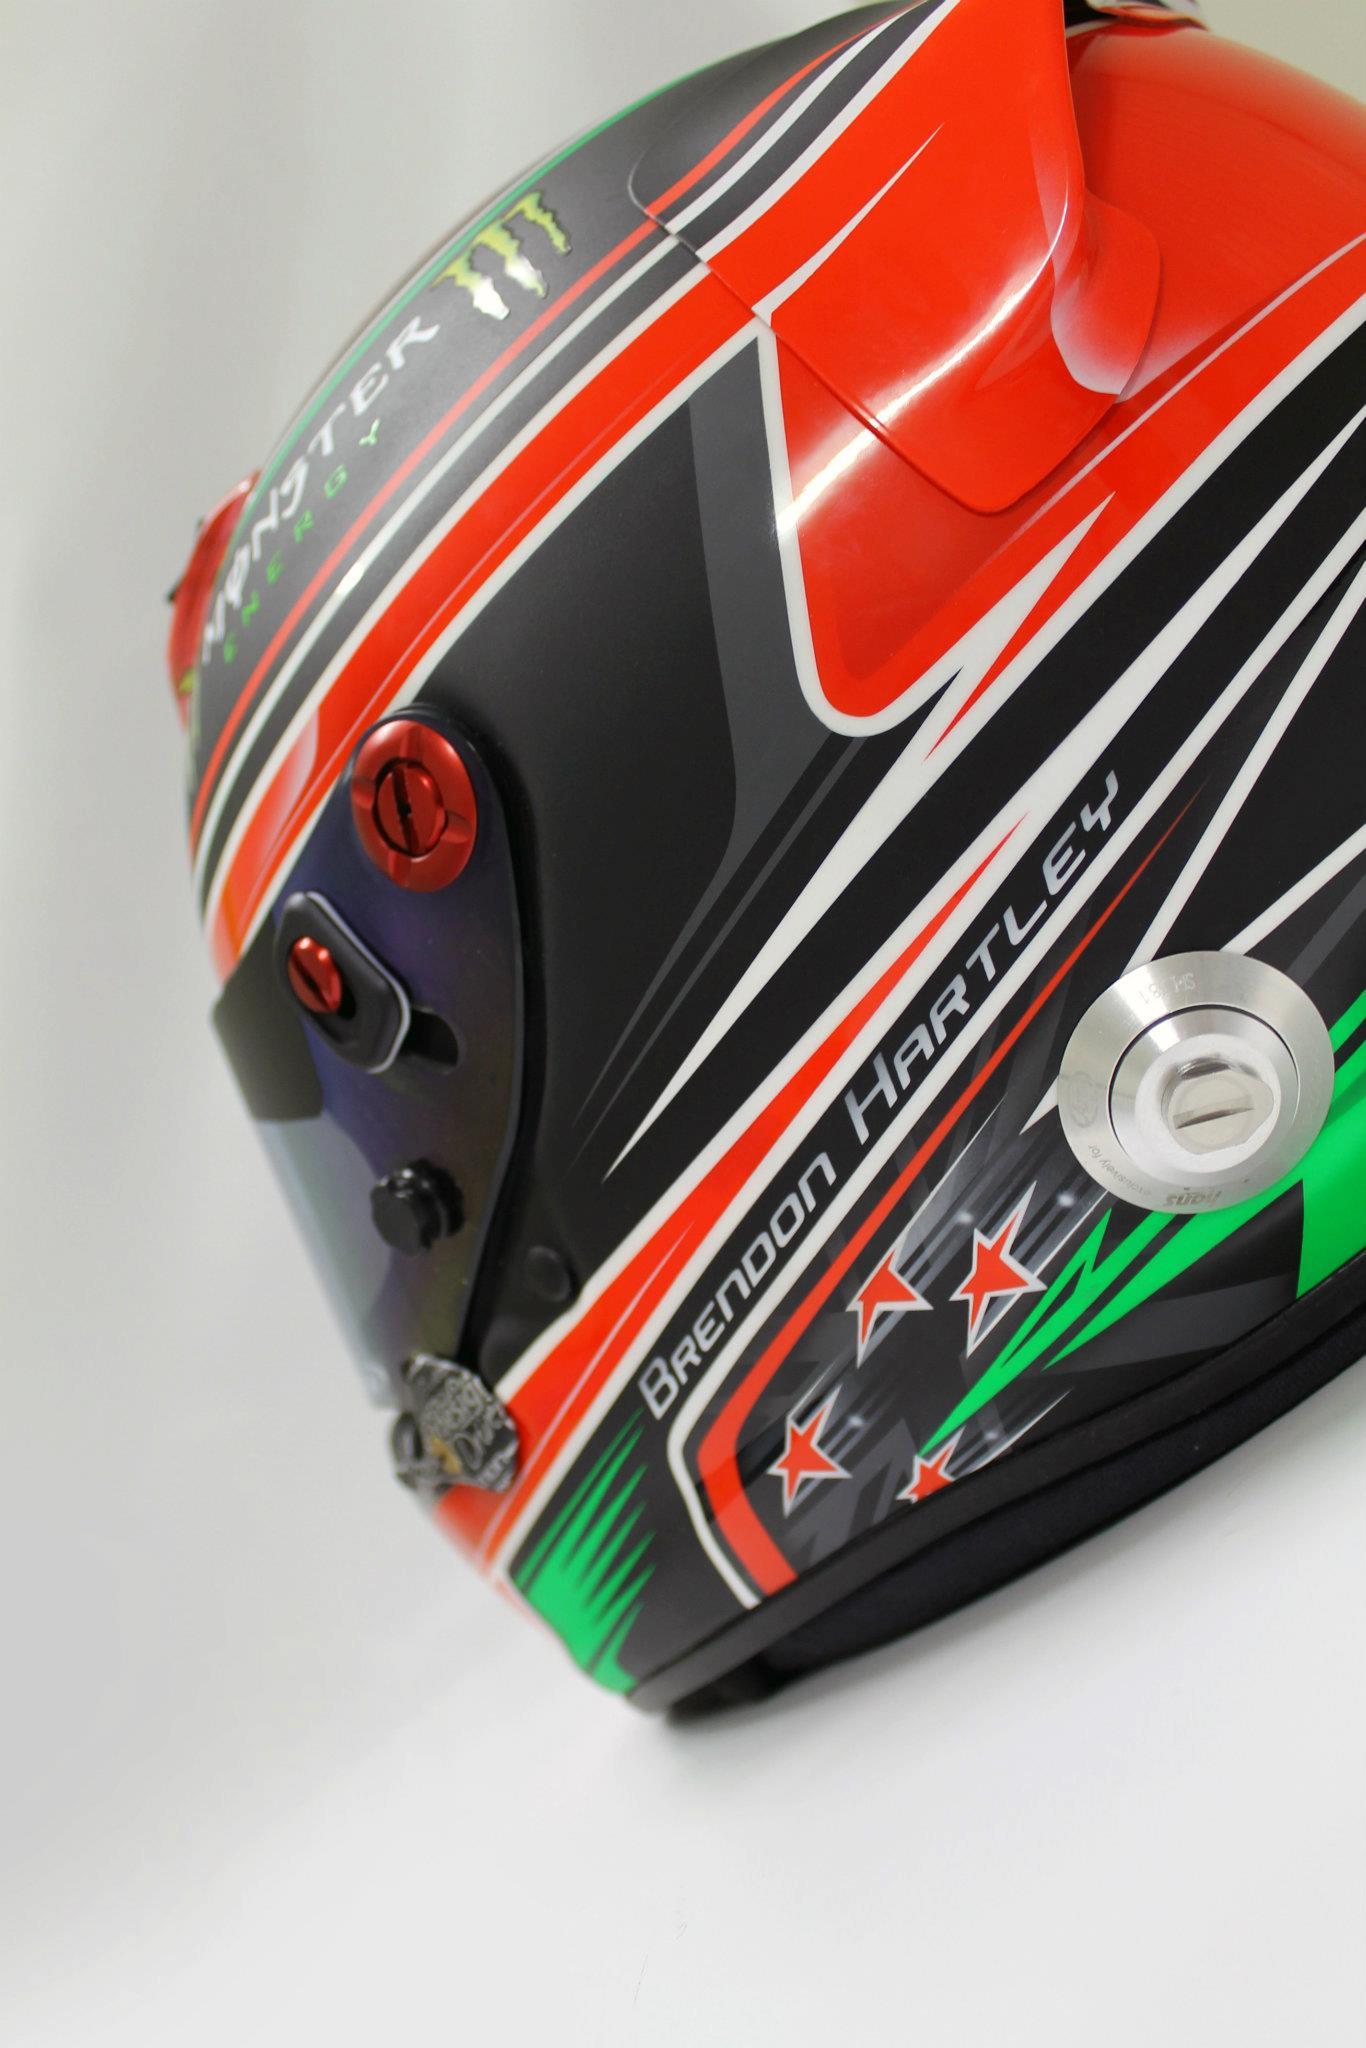 Brendon Hartley by Helmart Design - 395536030493493.jpg